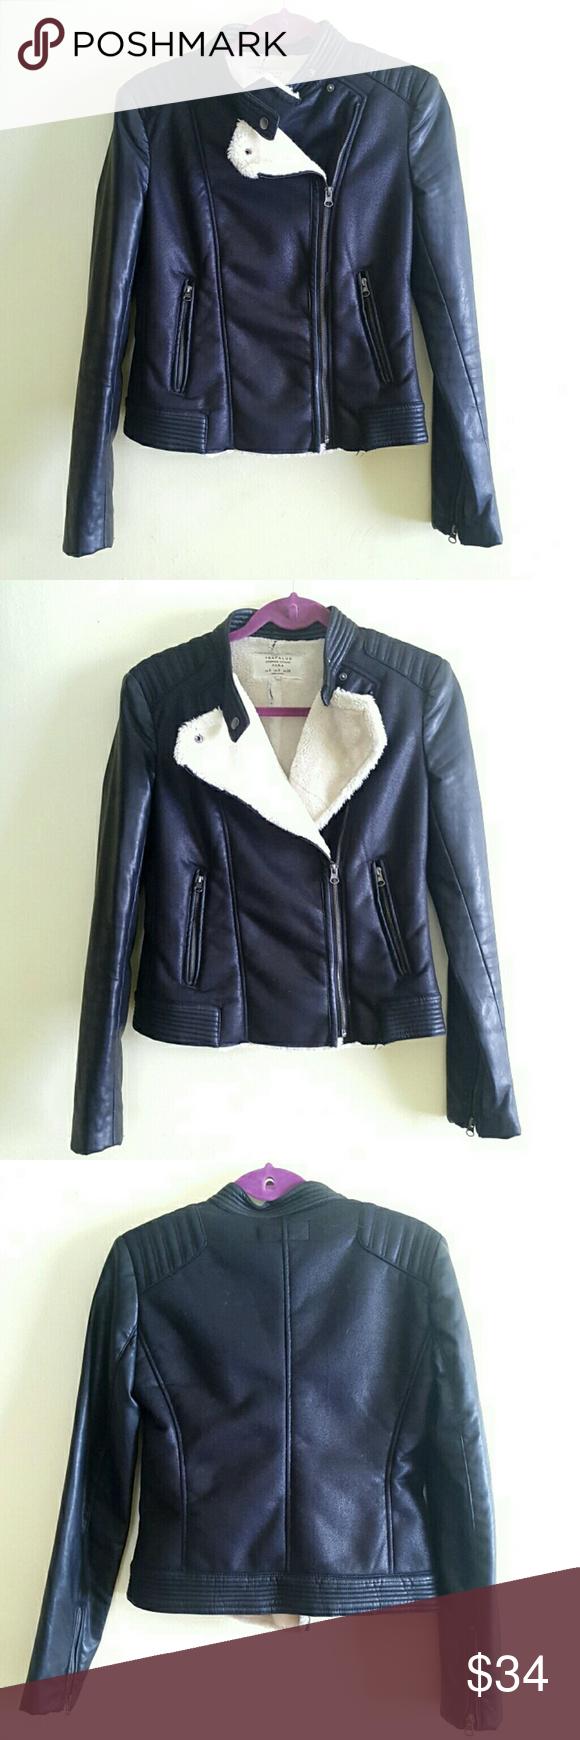 Zara Faux Fur Shearling Leather Moto Biker Jacket Gorgeous Faux Shearling Suede Zara Trafaluc Outerwear Jacket H Outerwear Jackets Leather Jacket Zara Jackets [ 1740 x 580 Pixel ]